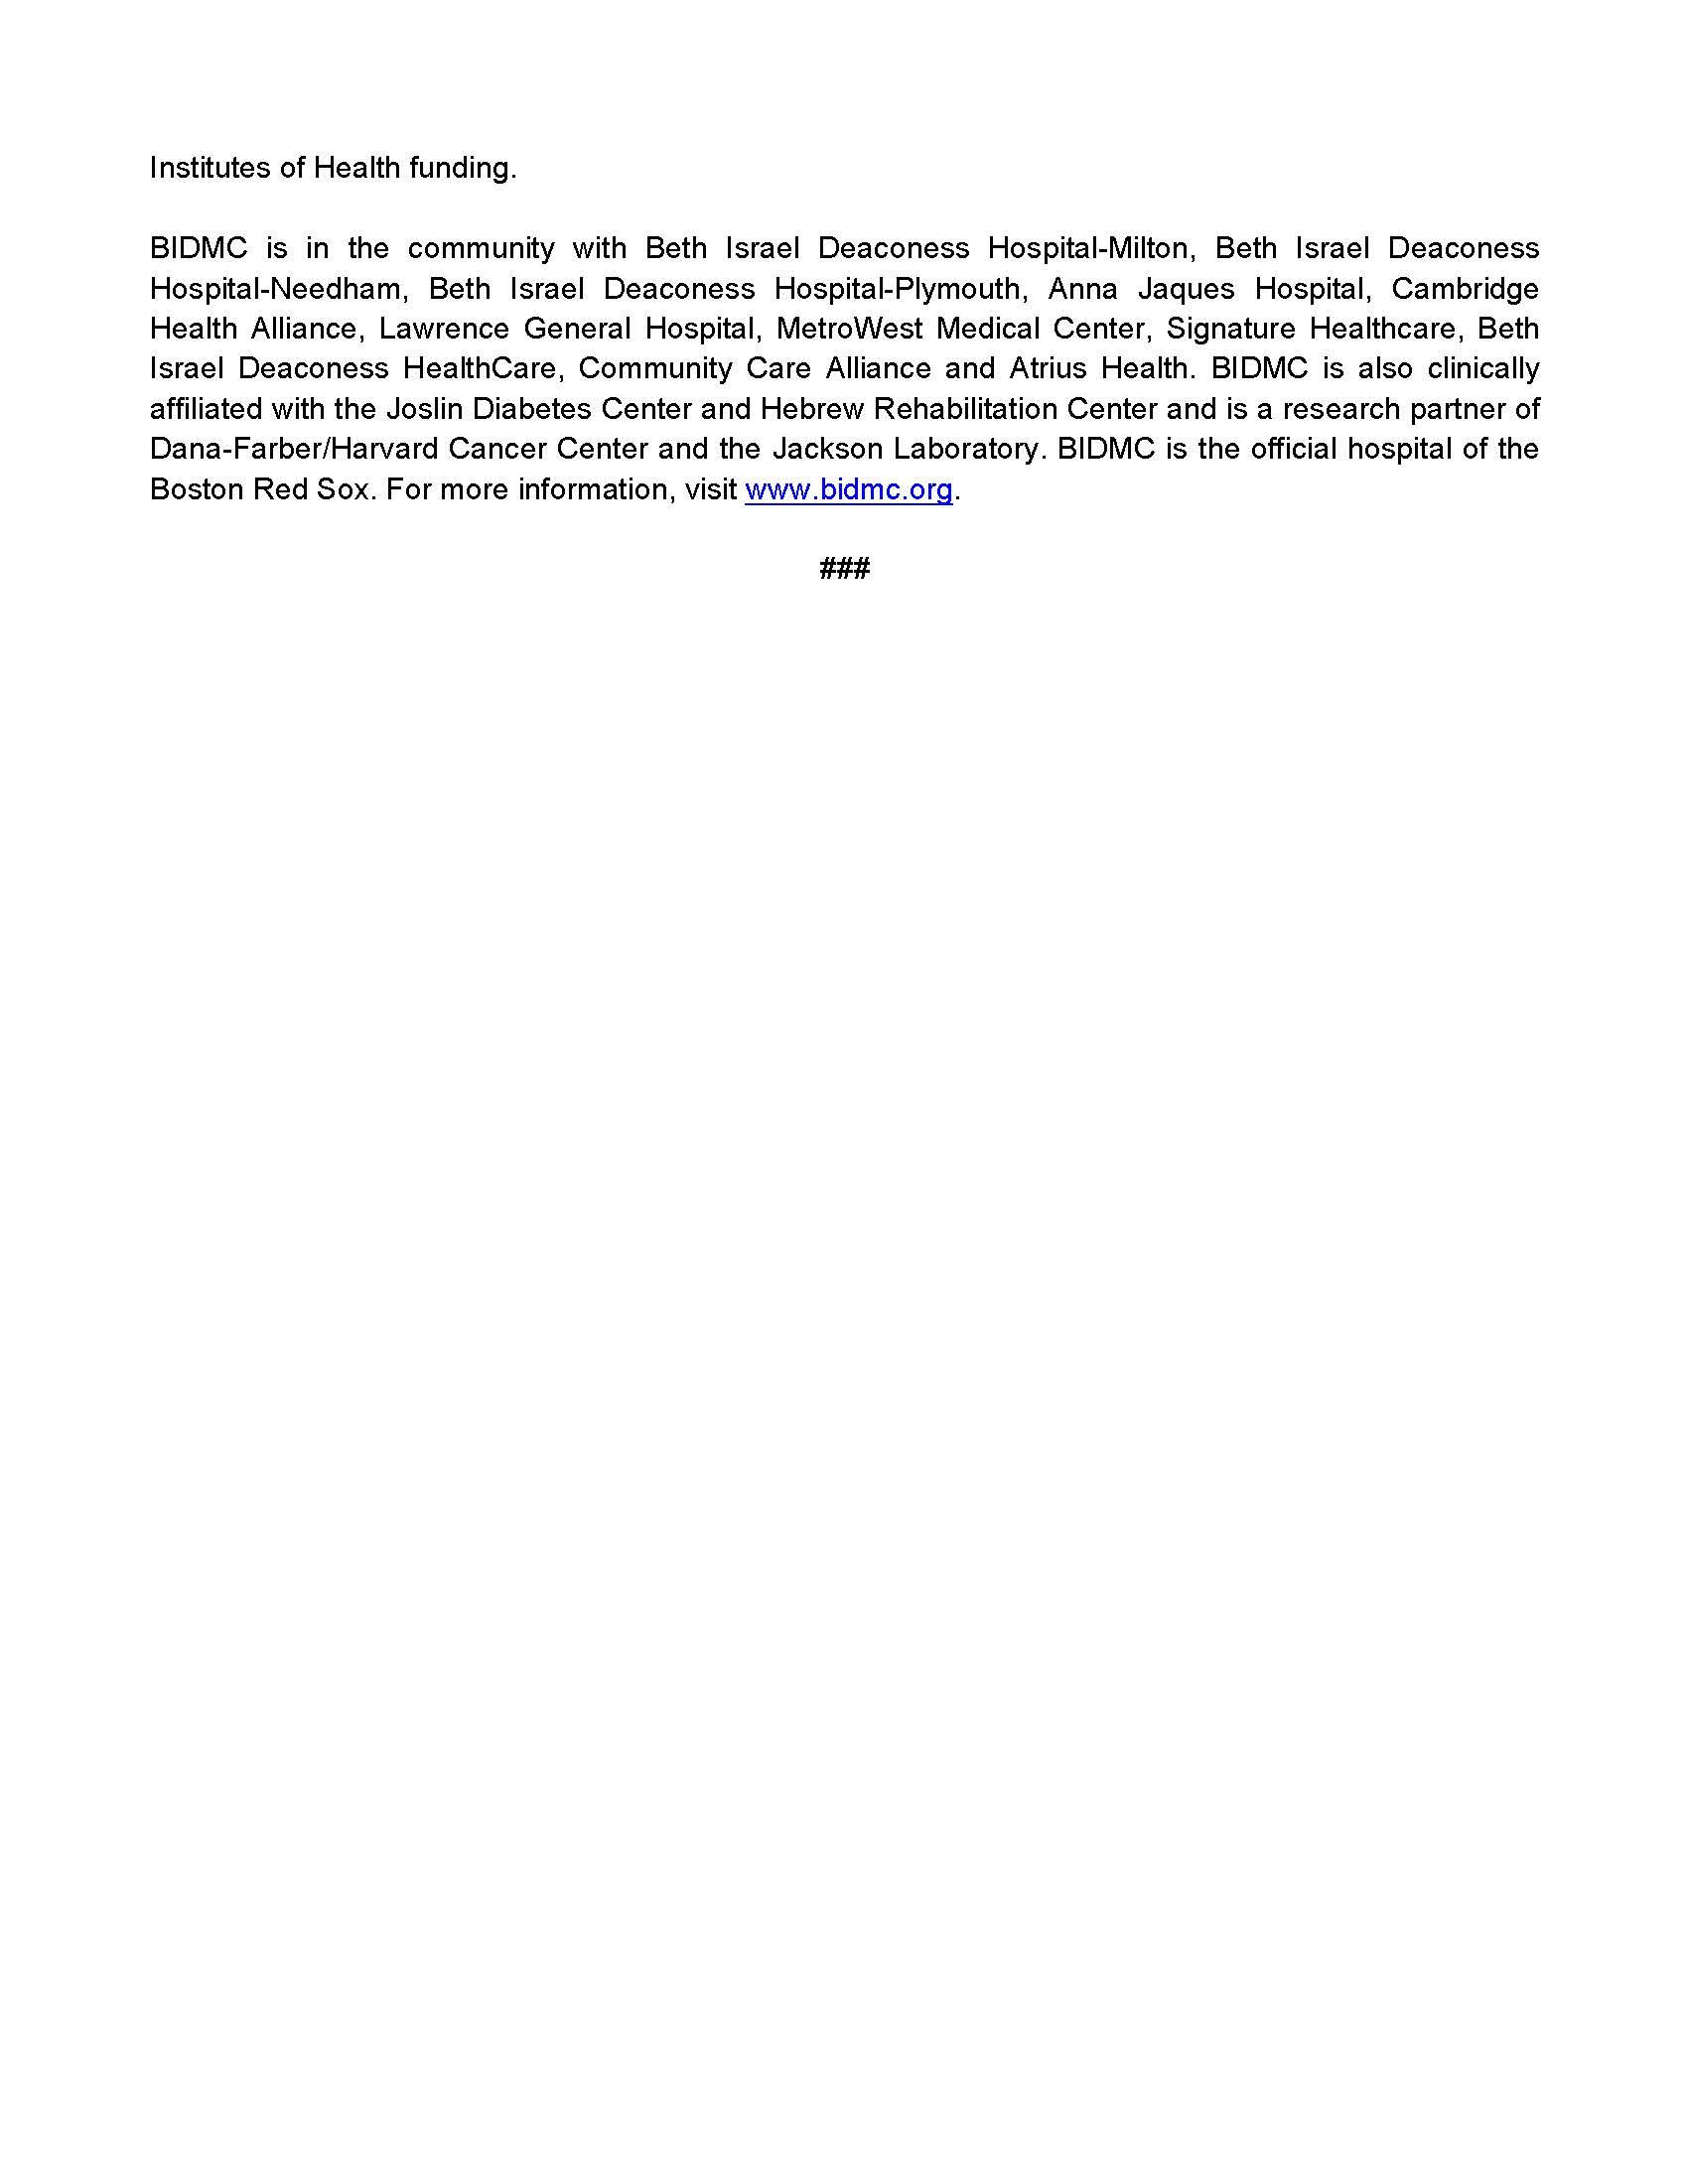 Sarah Hart BIDMC press release_Page_2.jpg